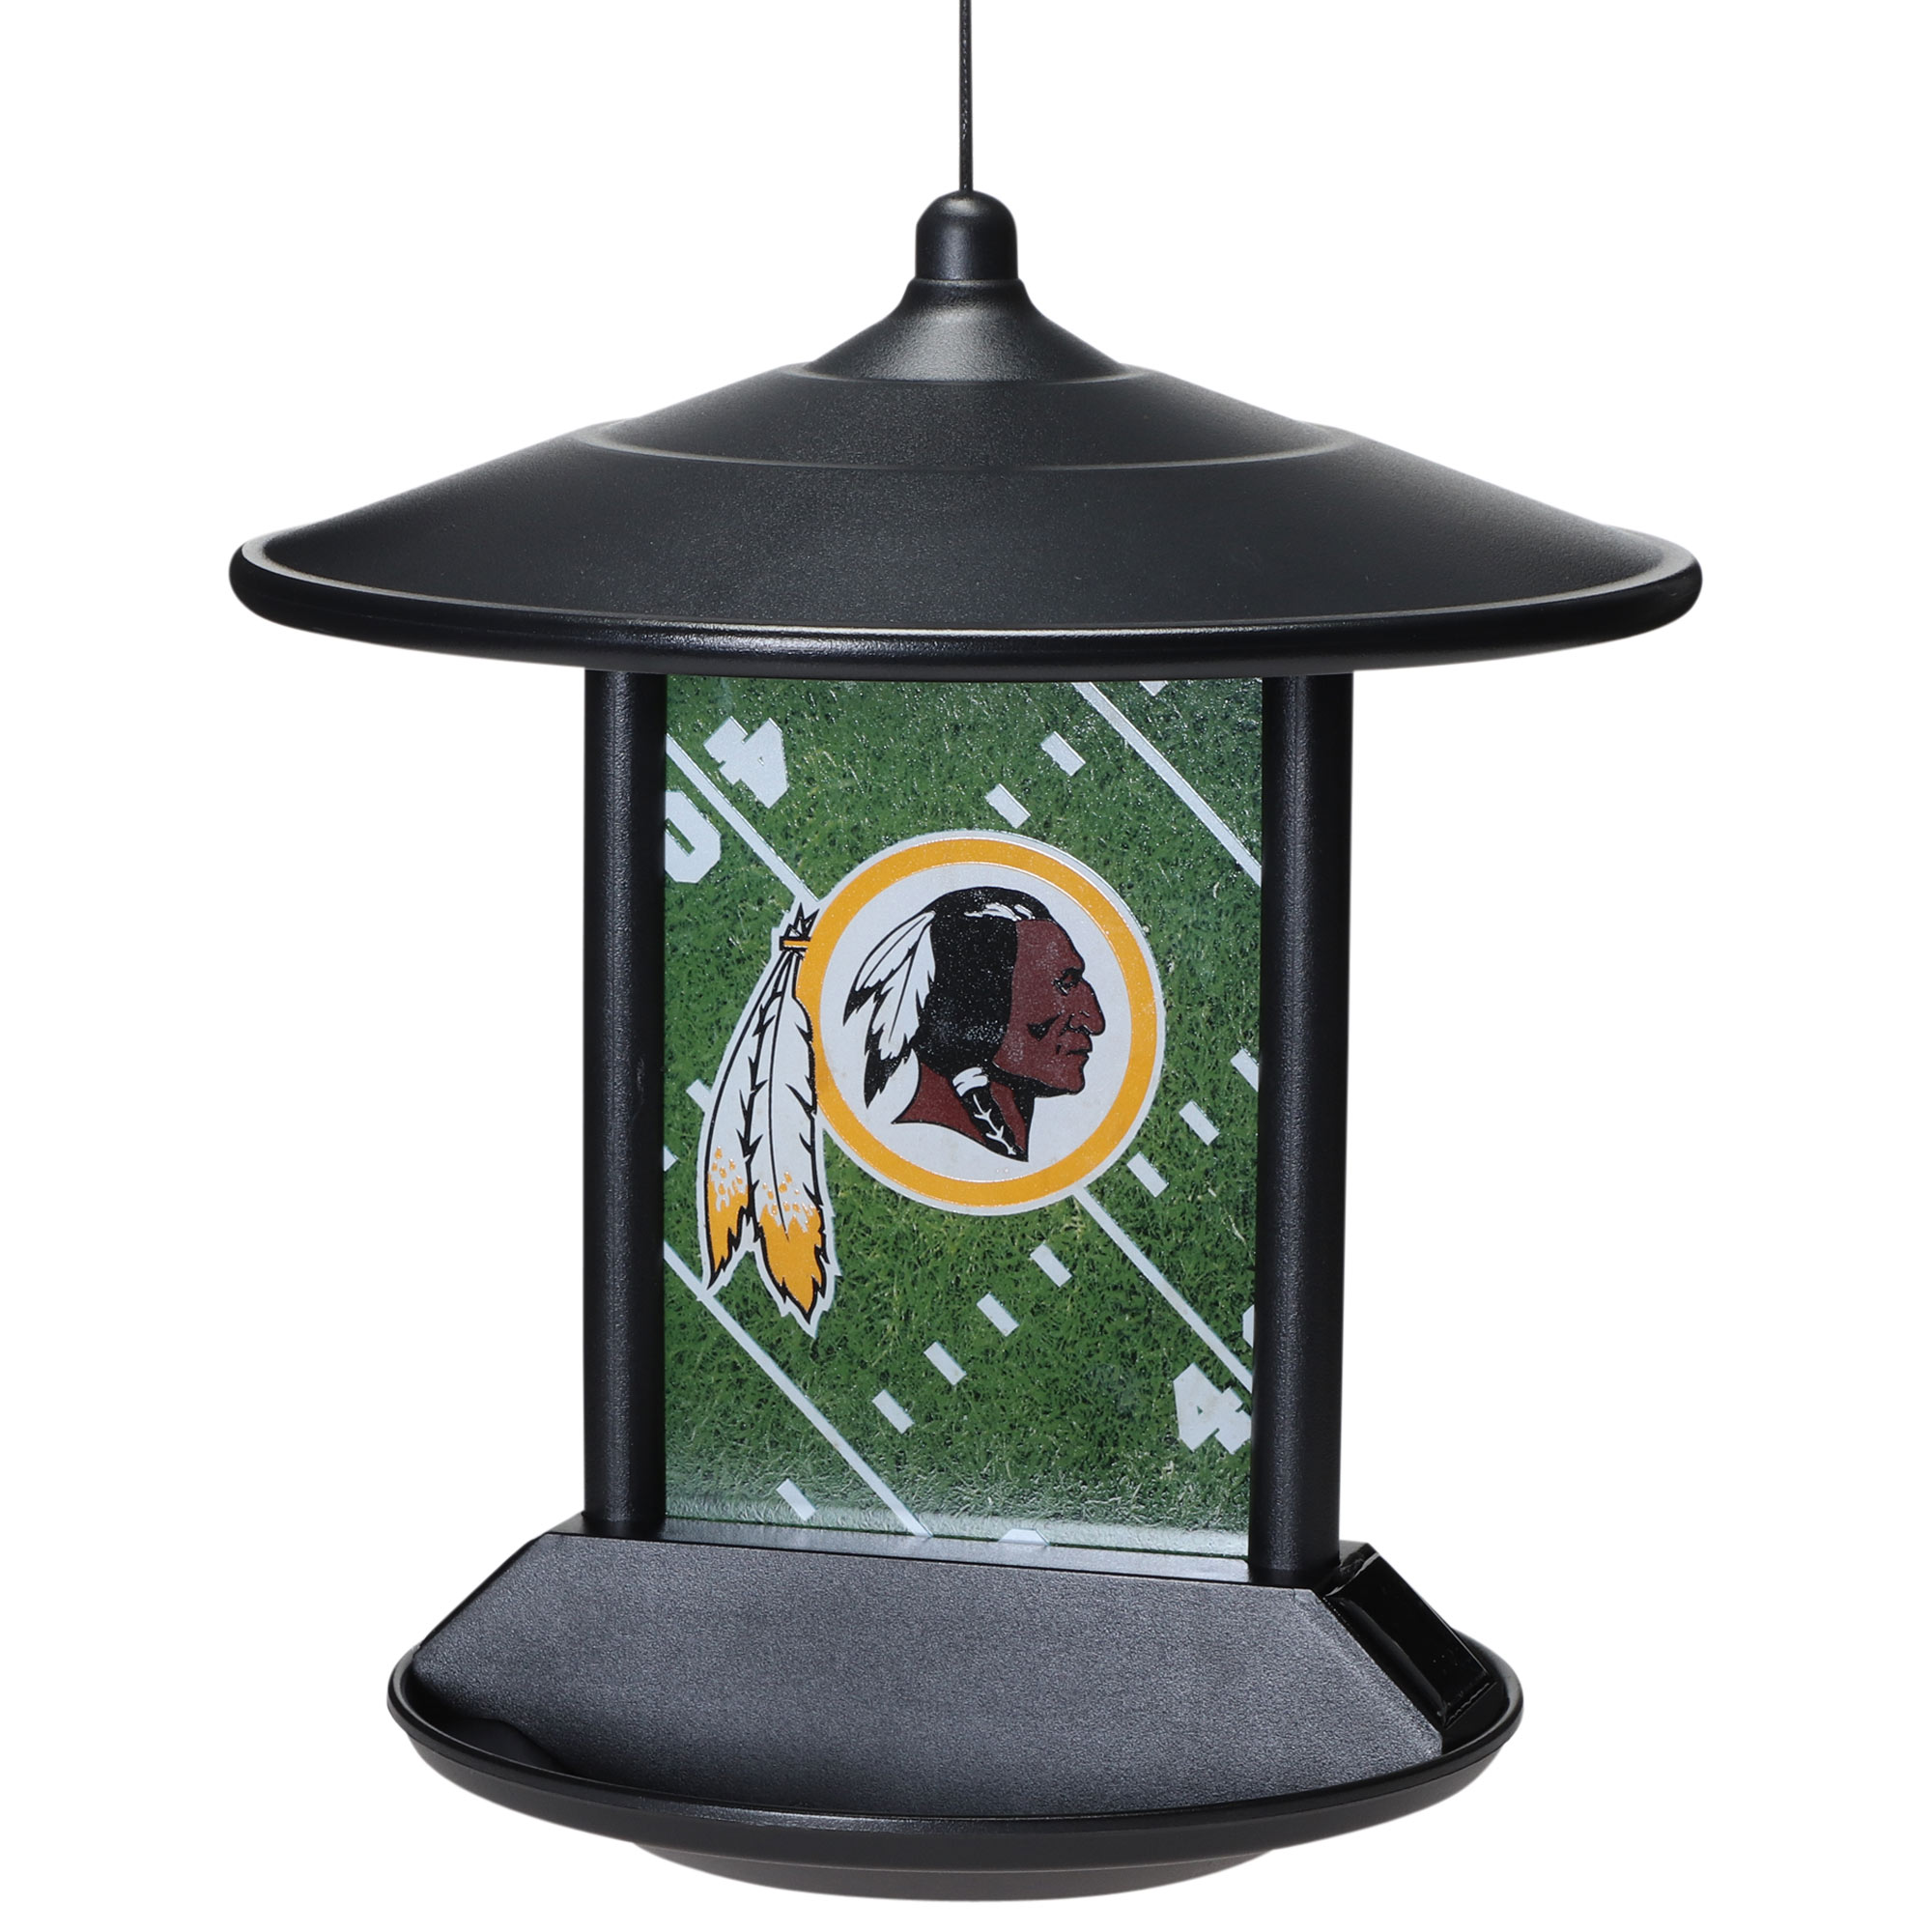 Washington Redskins Solar Feeder - No Size